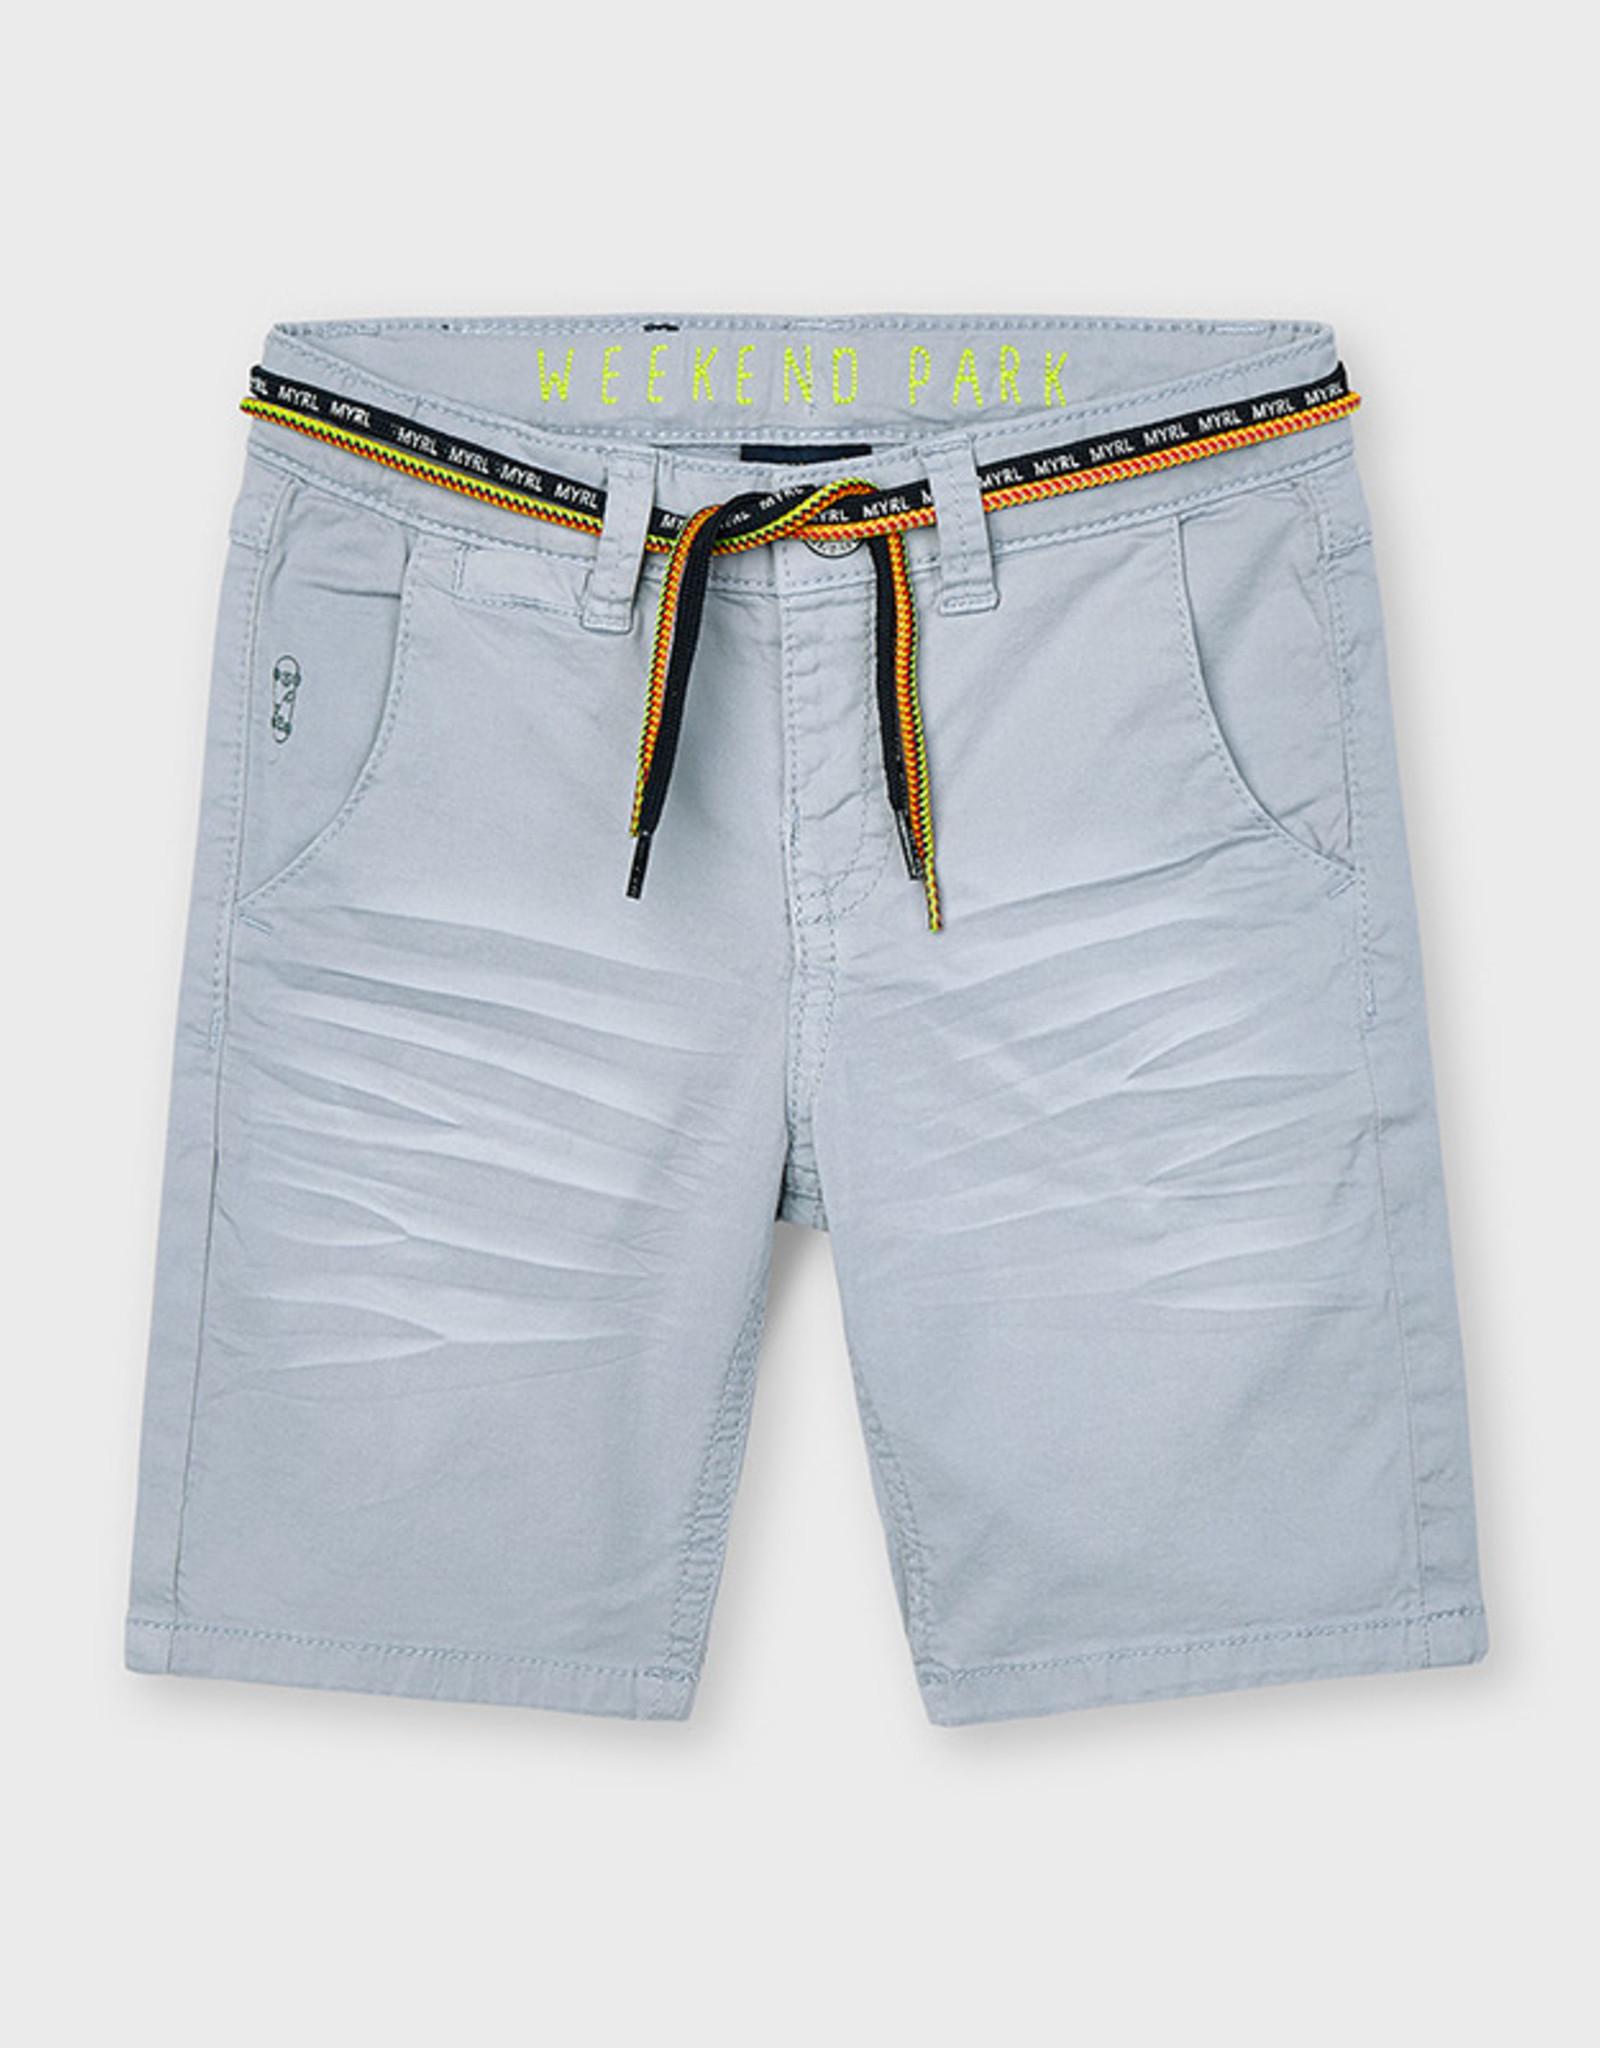 Mayoral SP21 B Grey Bermuda Shorts